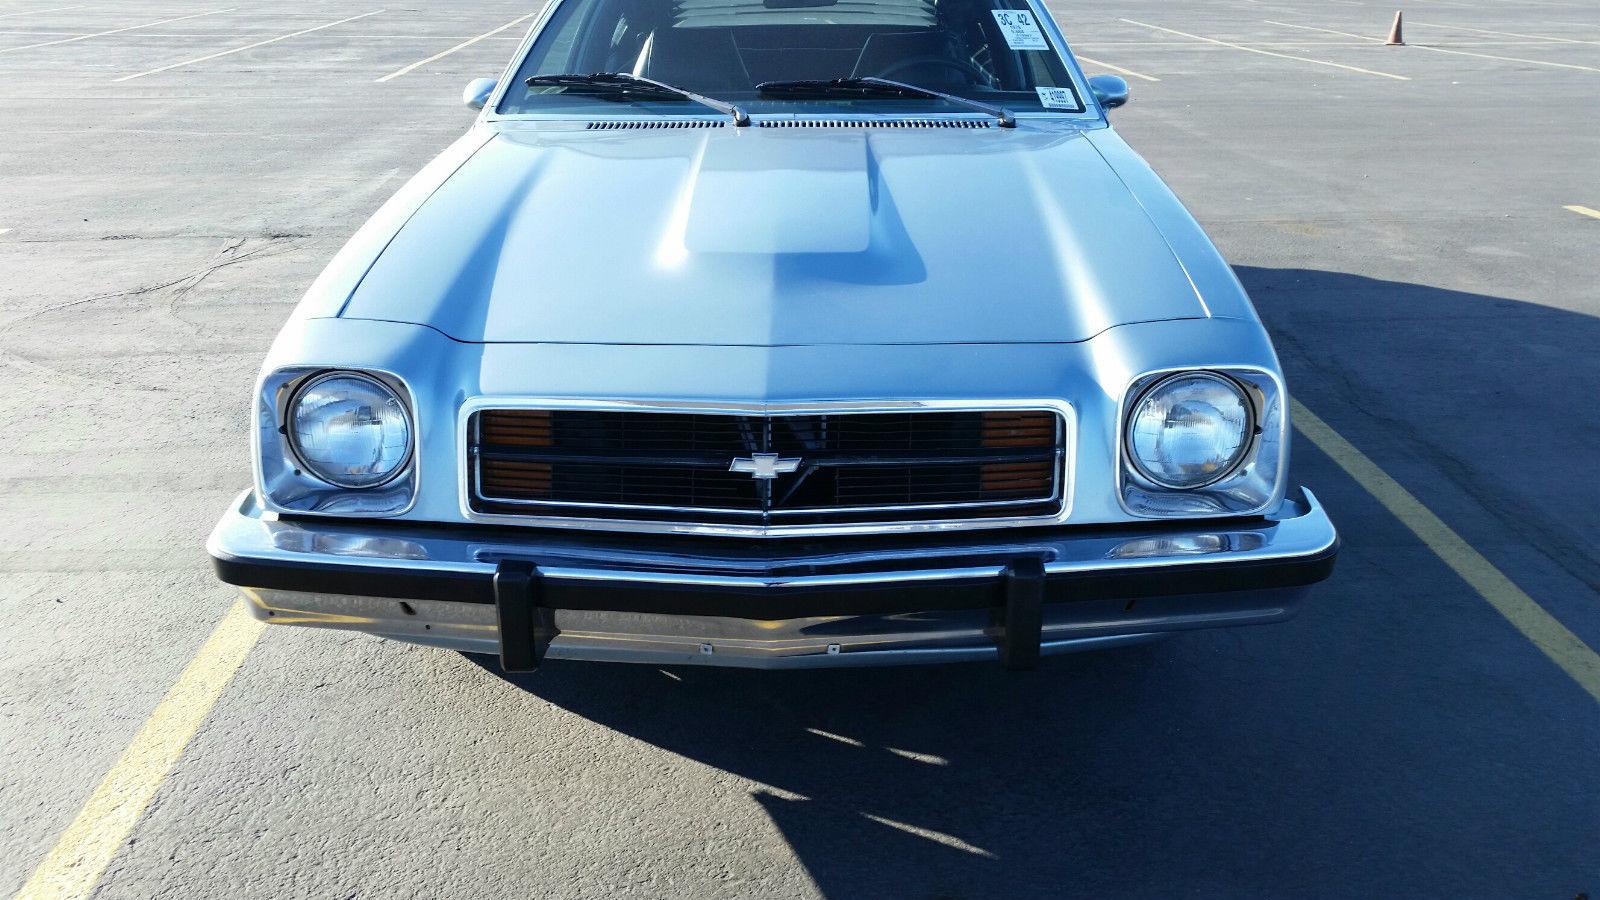 1978 Chevrolet Monza Spyder V8 2 2 Super Rare Classic